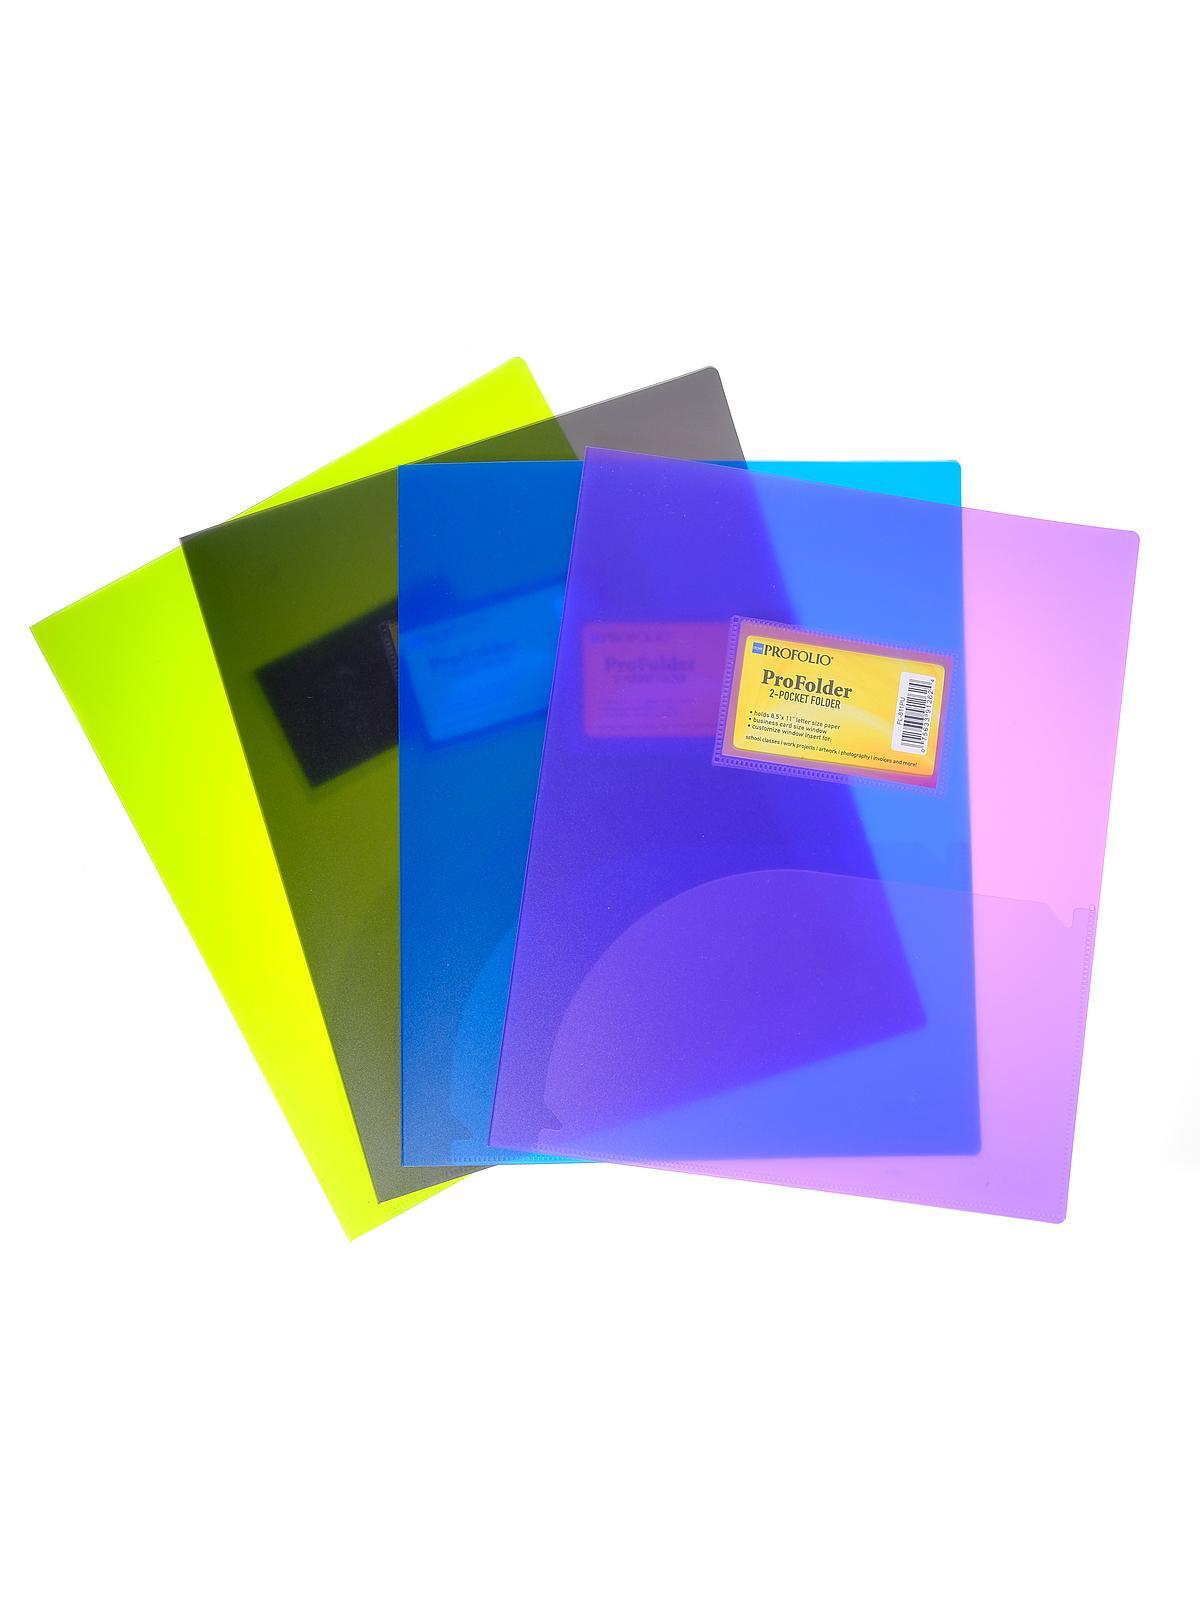 ProFolder 2-Pocket Folder